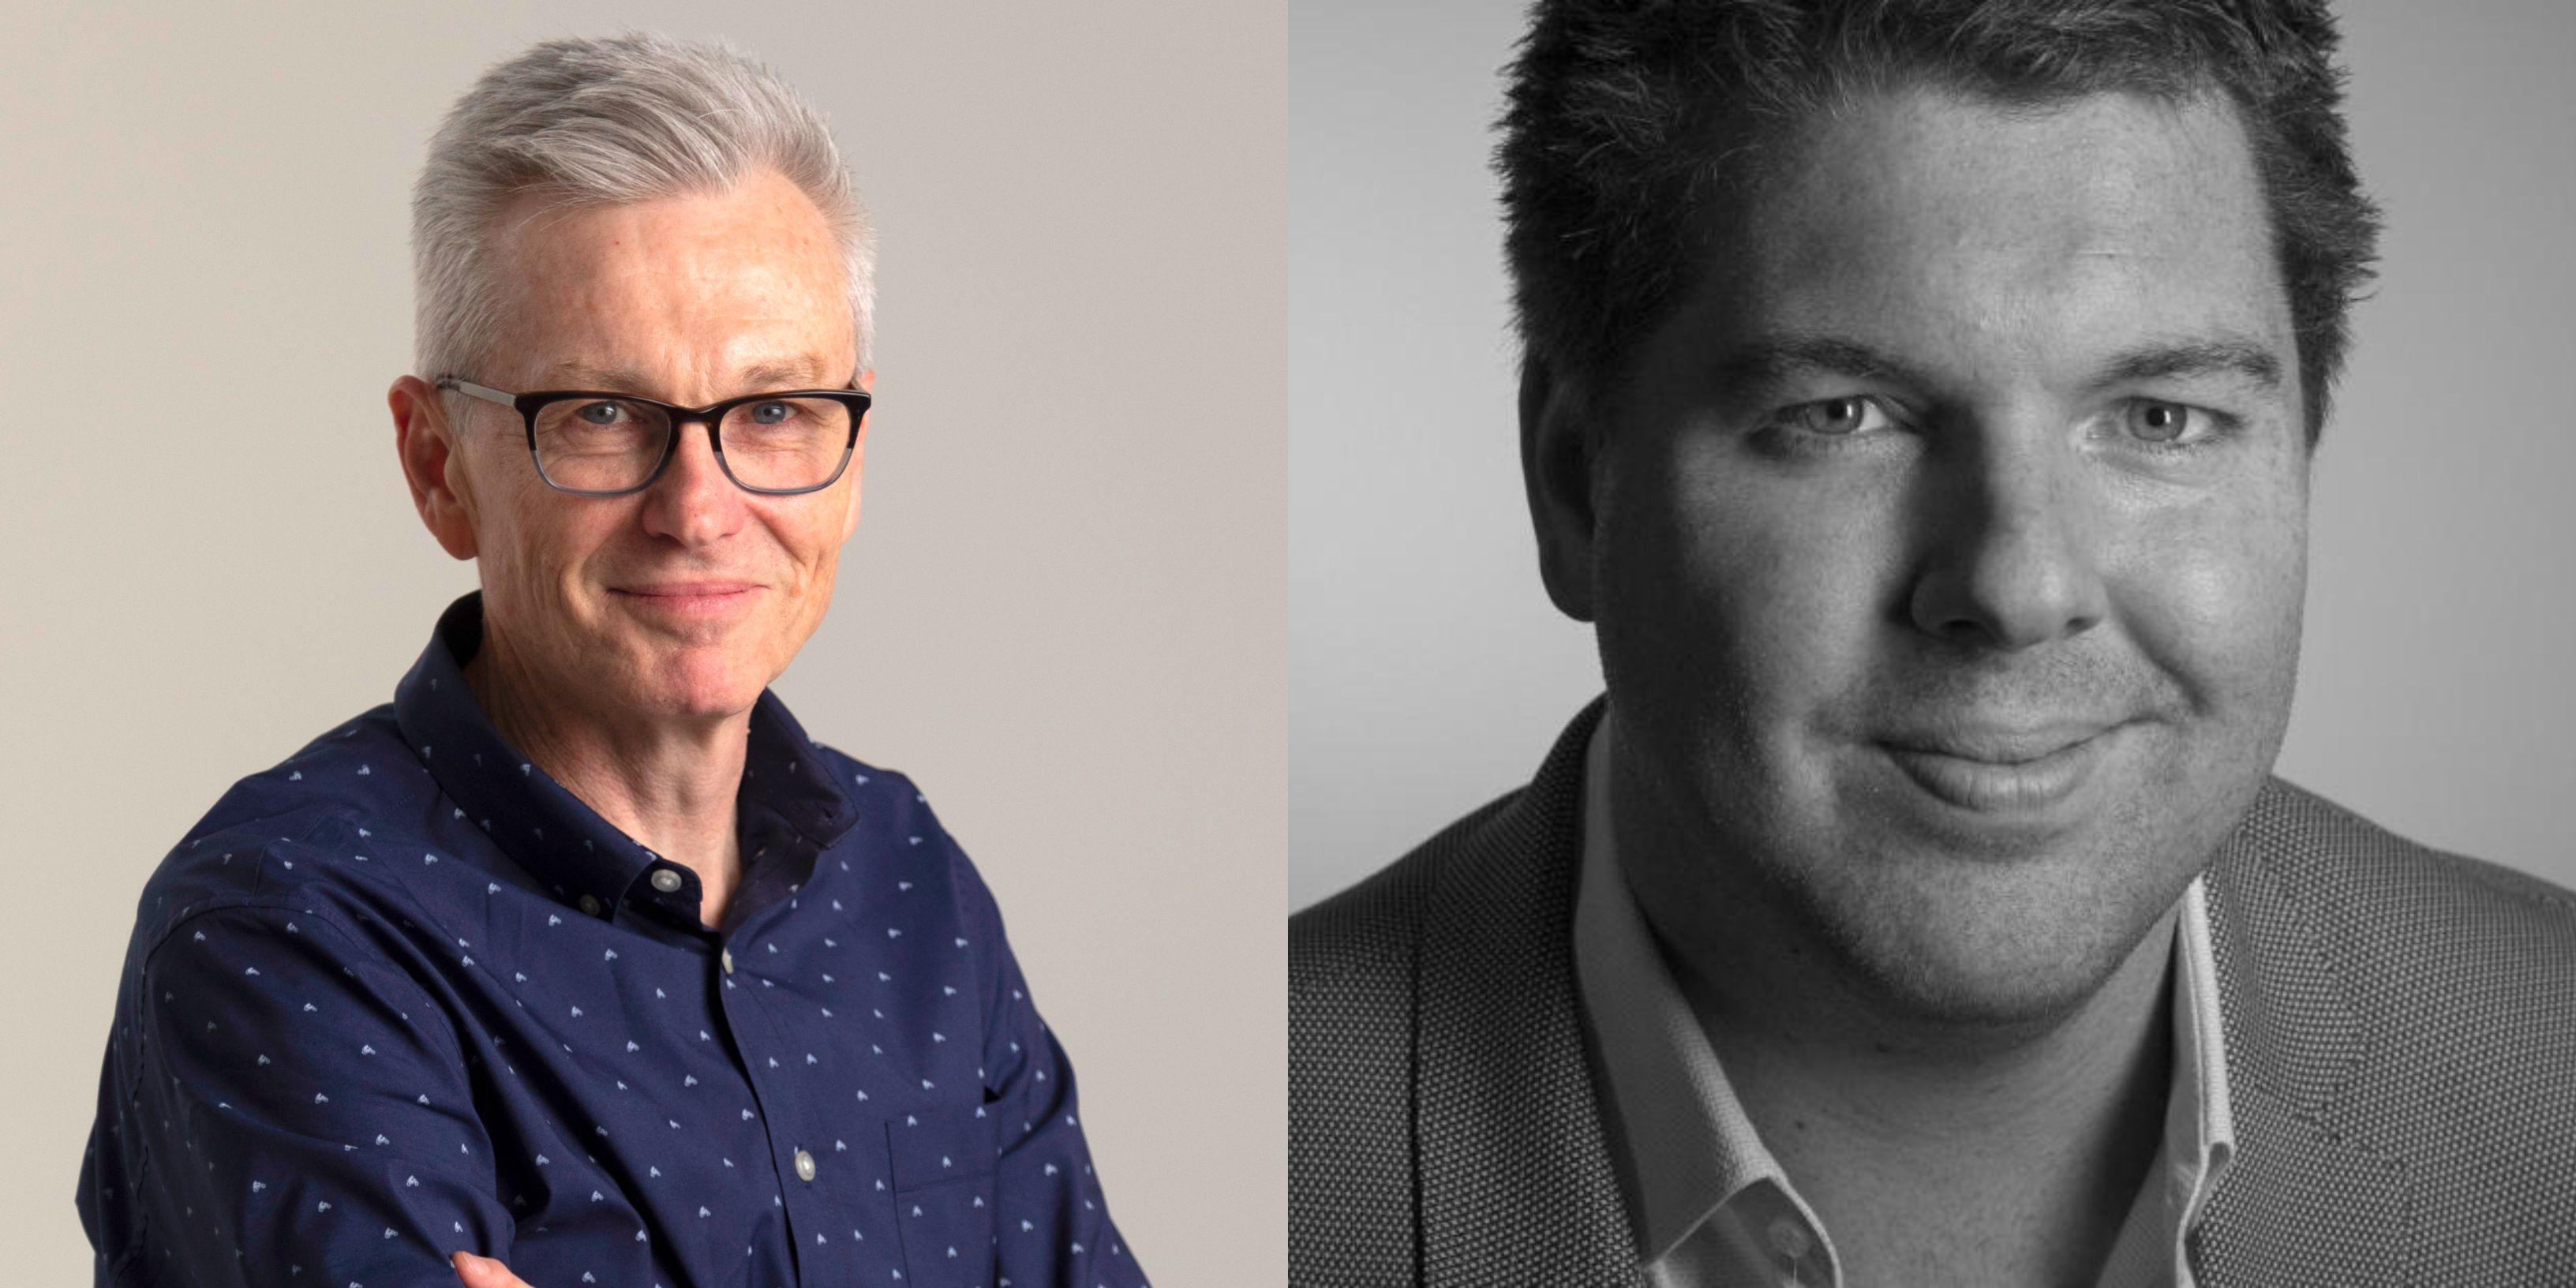 Aussie expat Jon Bird set to replace Aden Hepburn as regional CEO of VMLY&R Australia and NZ